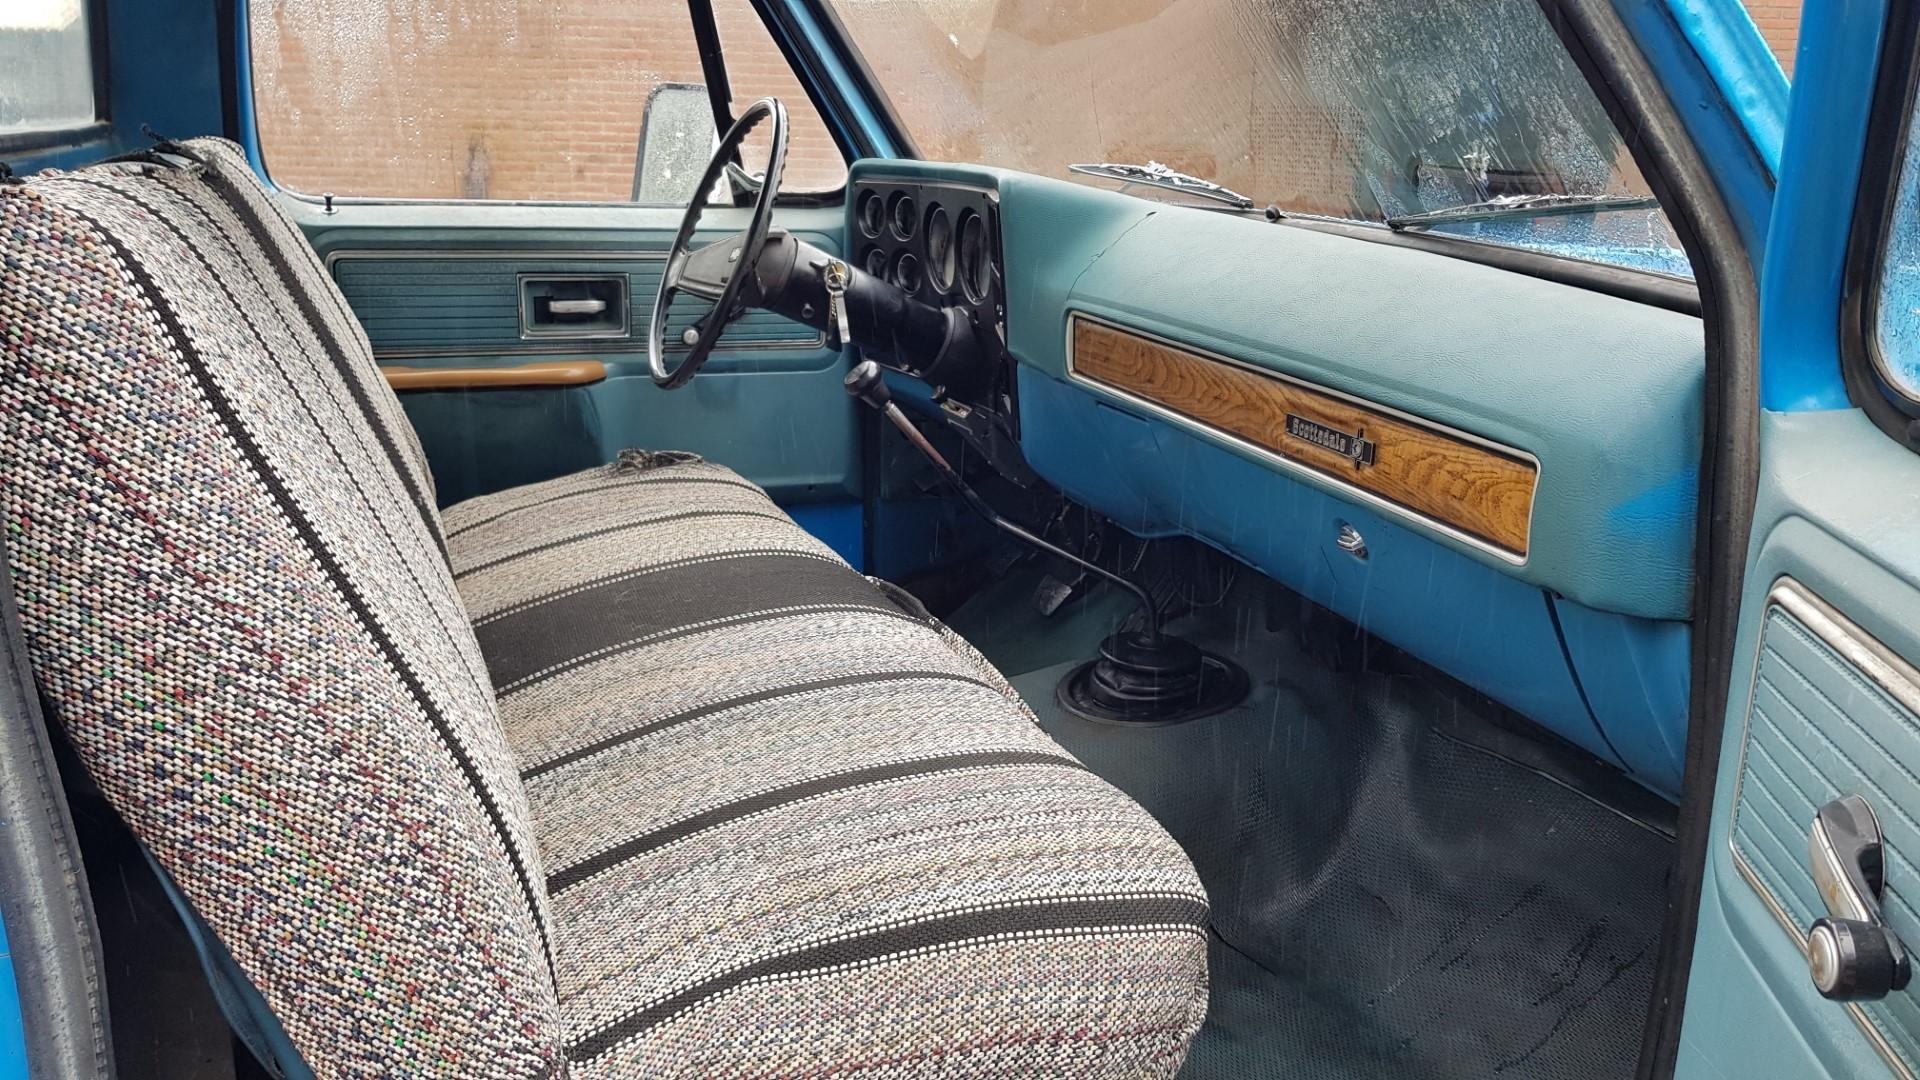 1977-Chevrolet-C20-Scottsdale-350ci-Manual-14